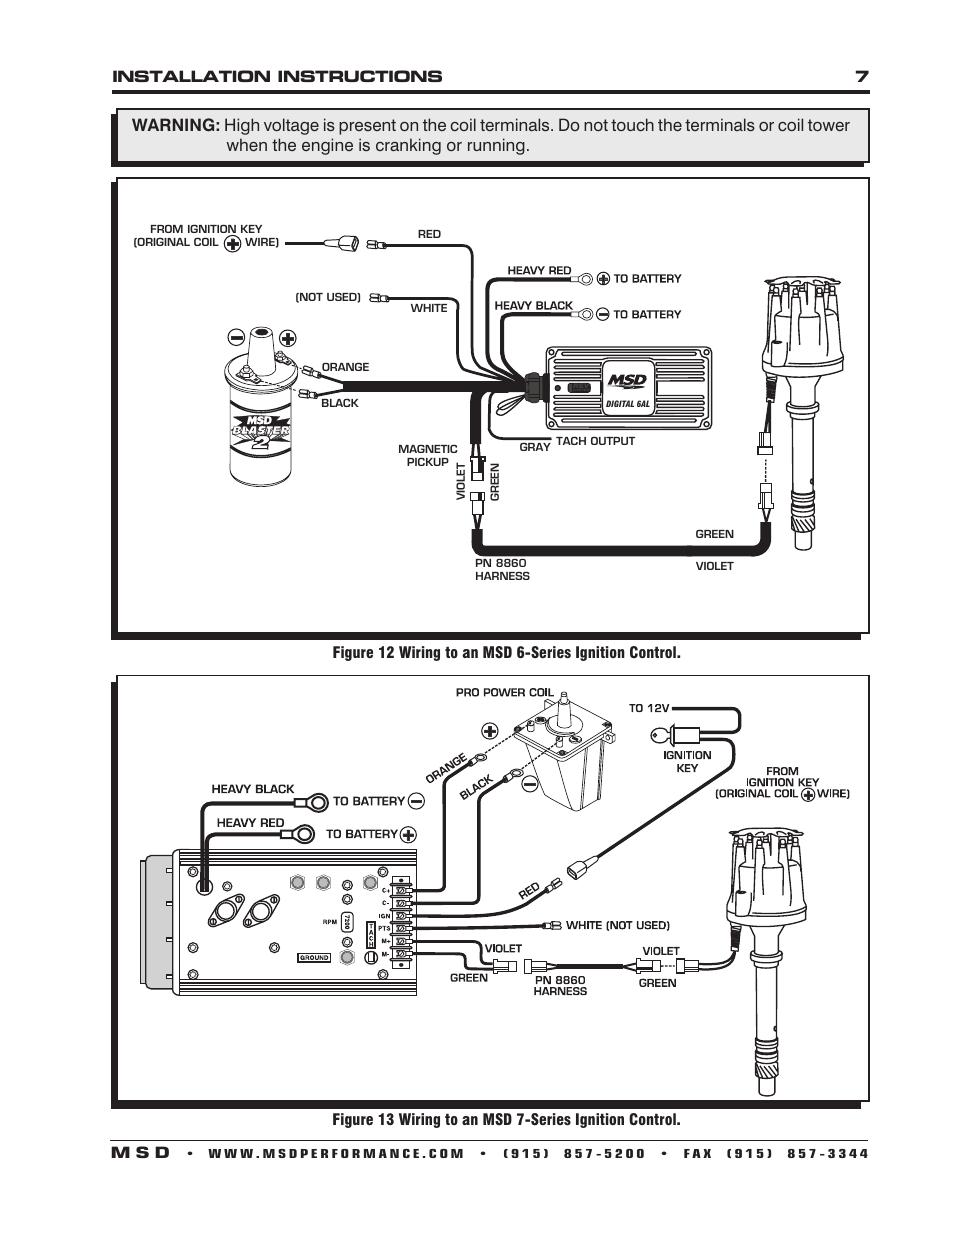 msd wiring diagram chevy wiring msd 8570 wiring diagram e6 msd wiring diagrams and technotes chevy wiring msd 8570 wiring diagram e6